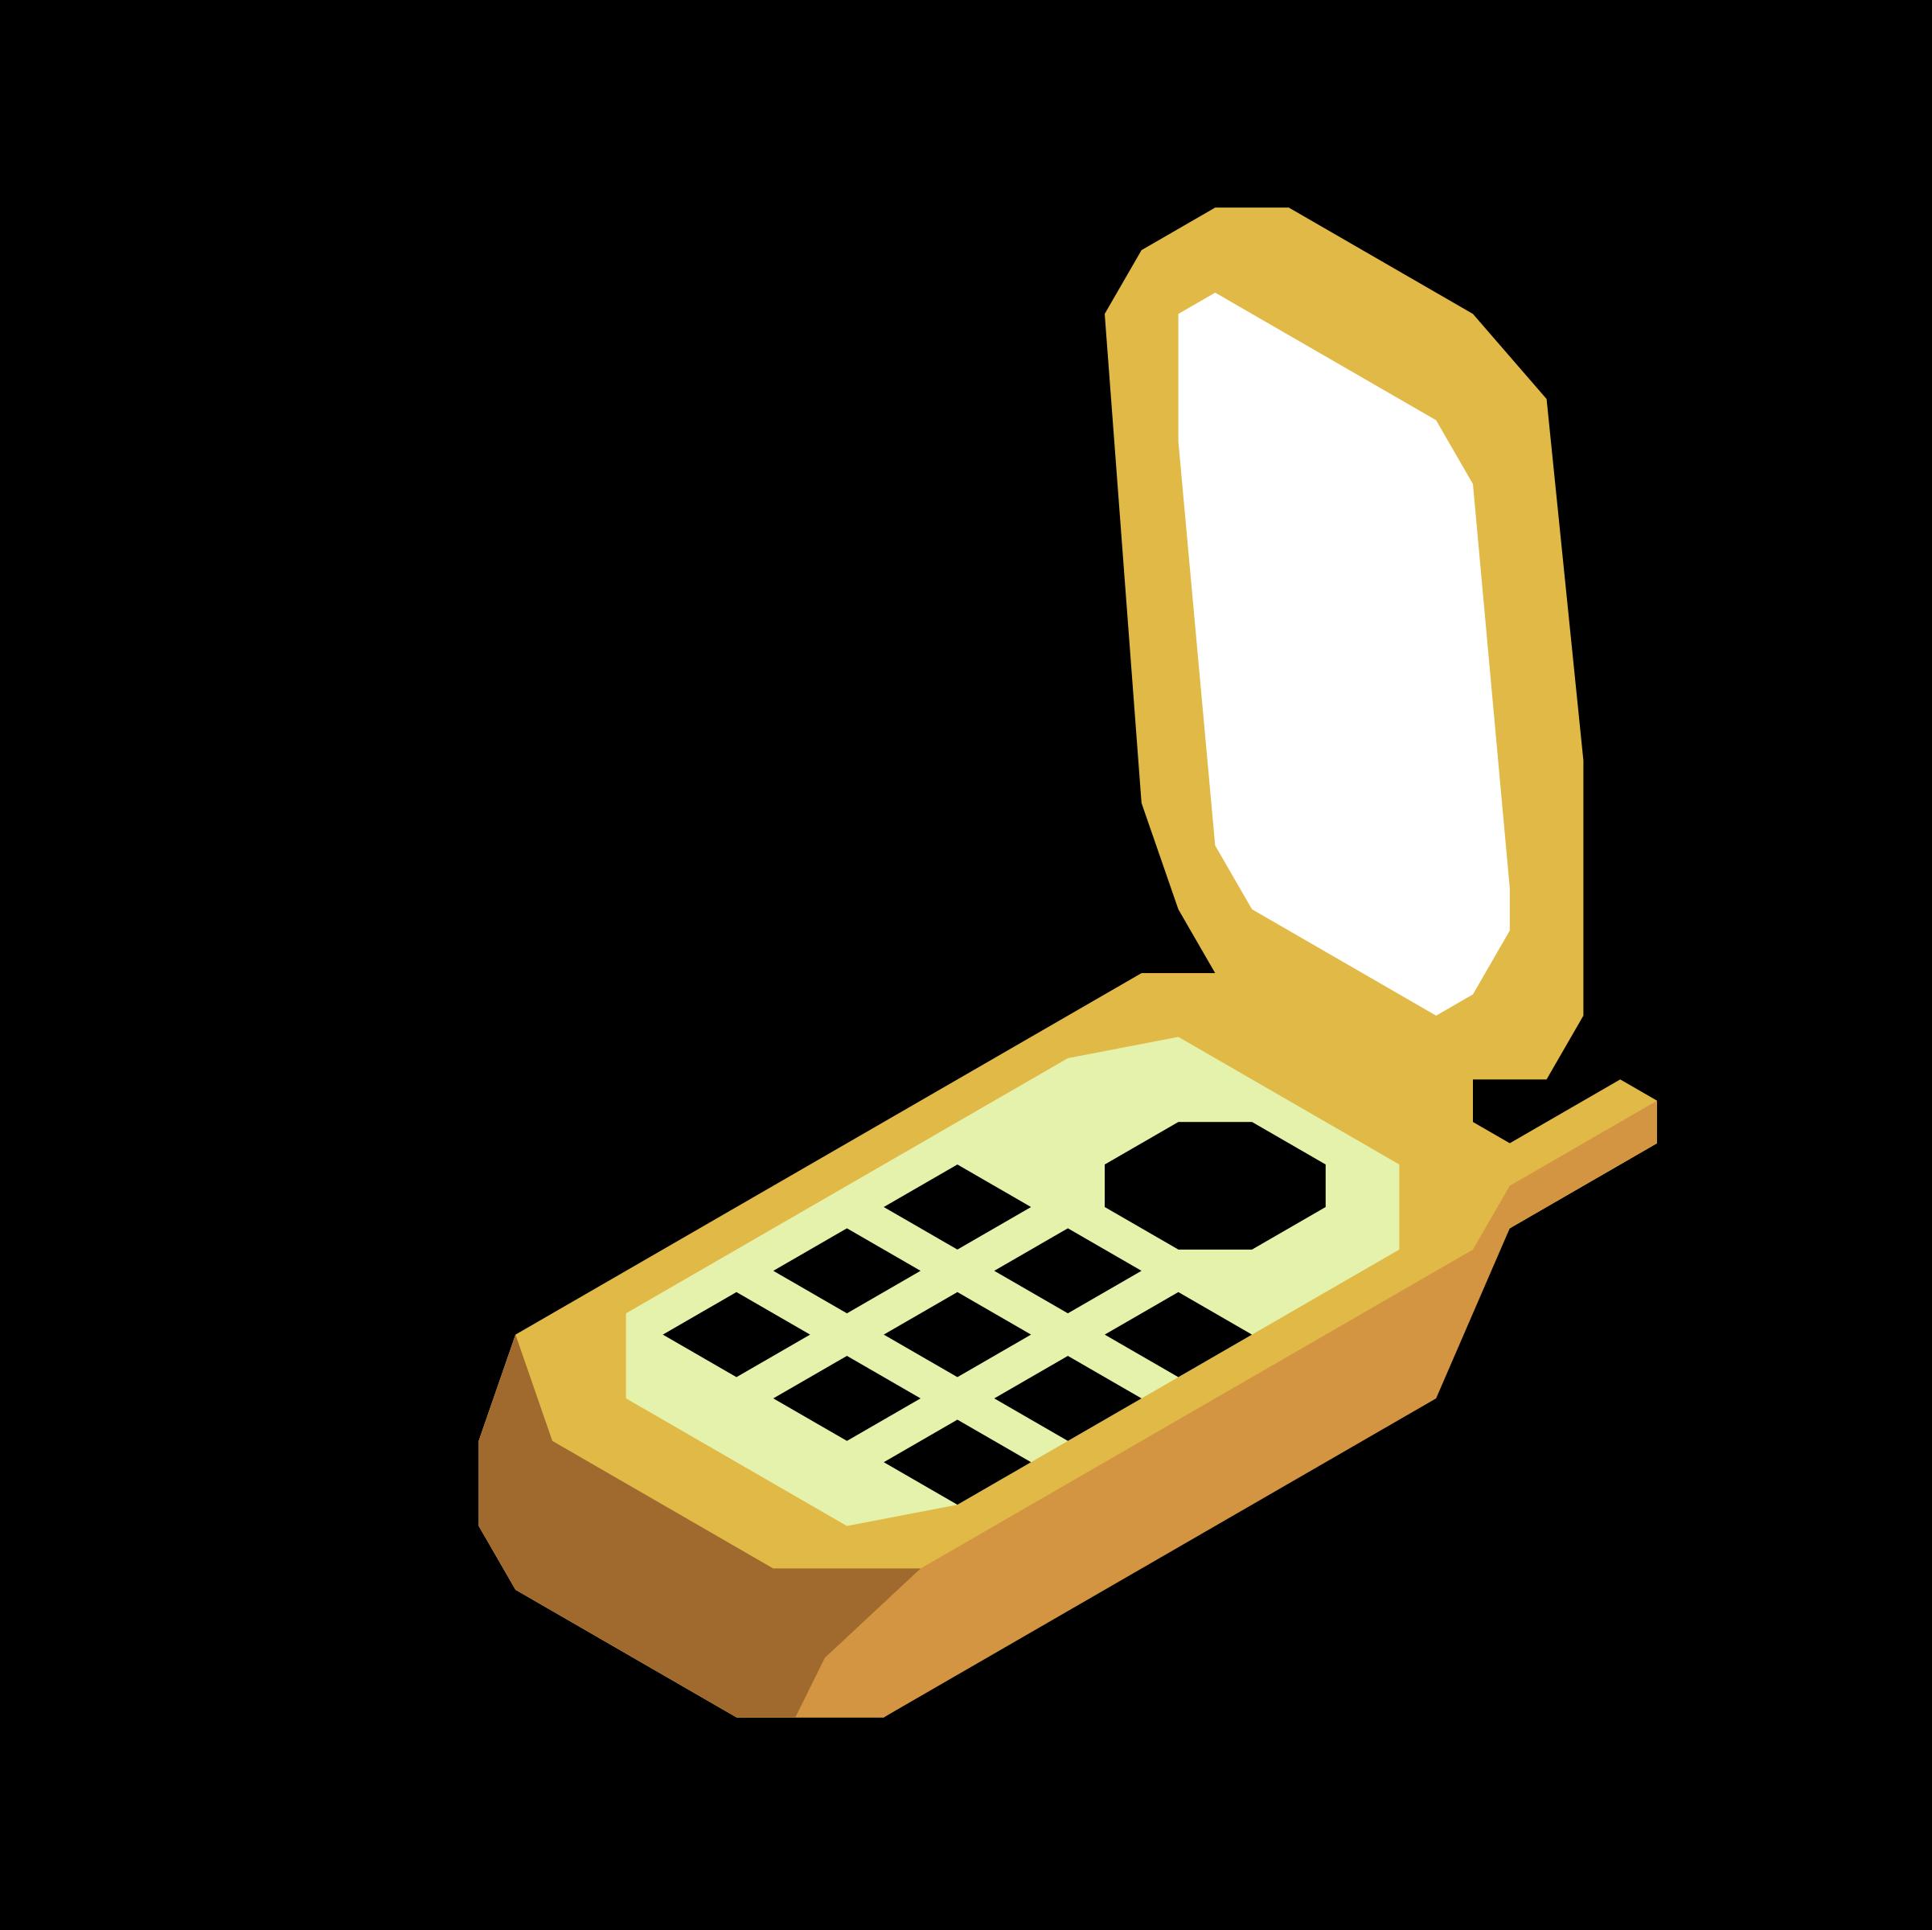 Clipart phone cartoon. Mobile big image png